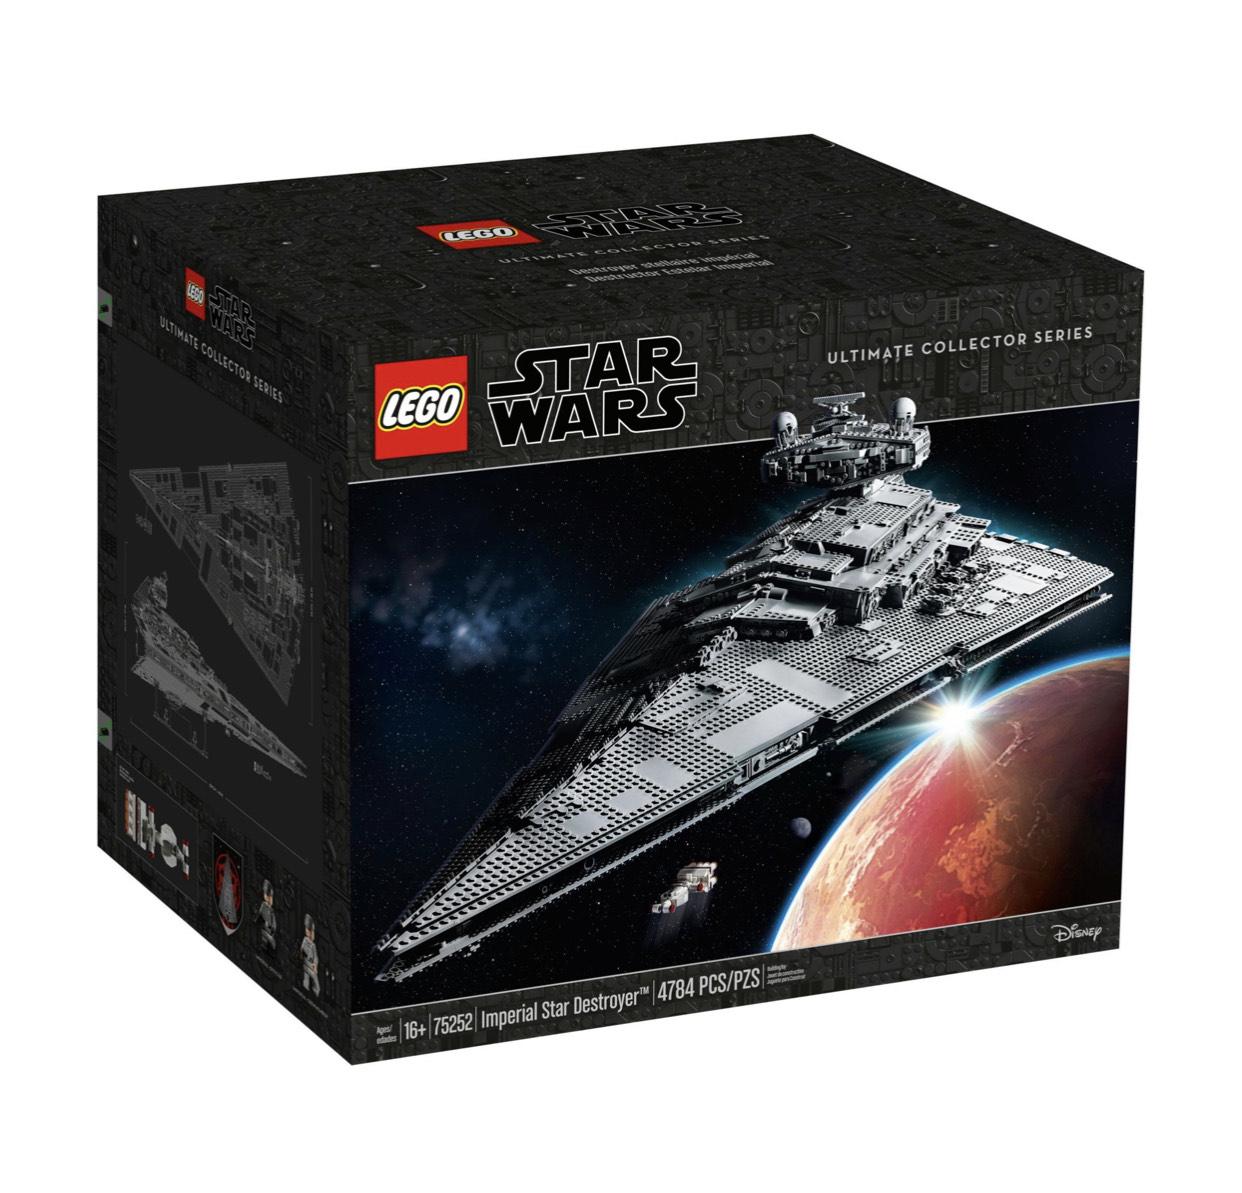 LEGO Star Wars Imperial Star Destroyer 75252